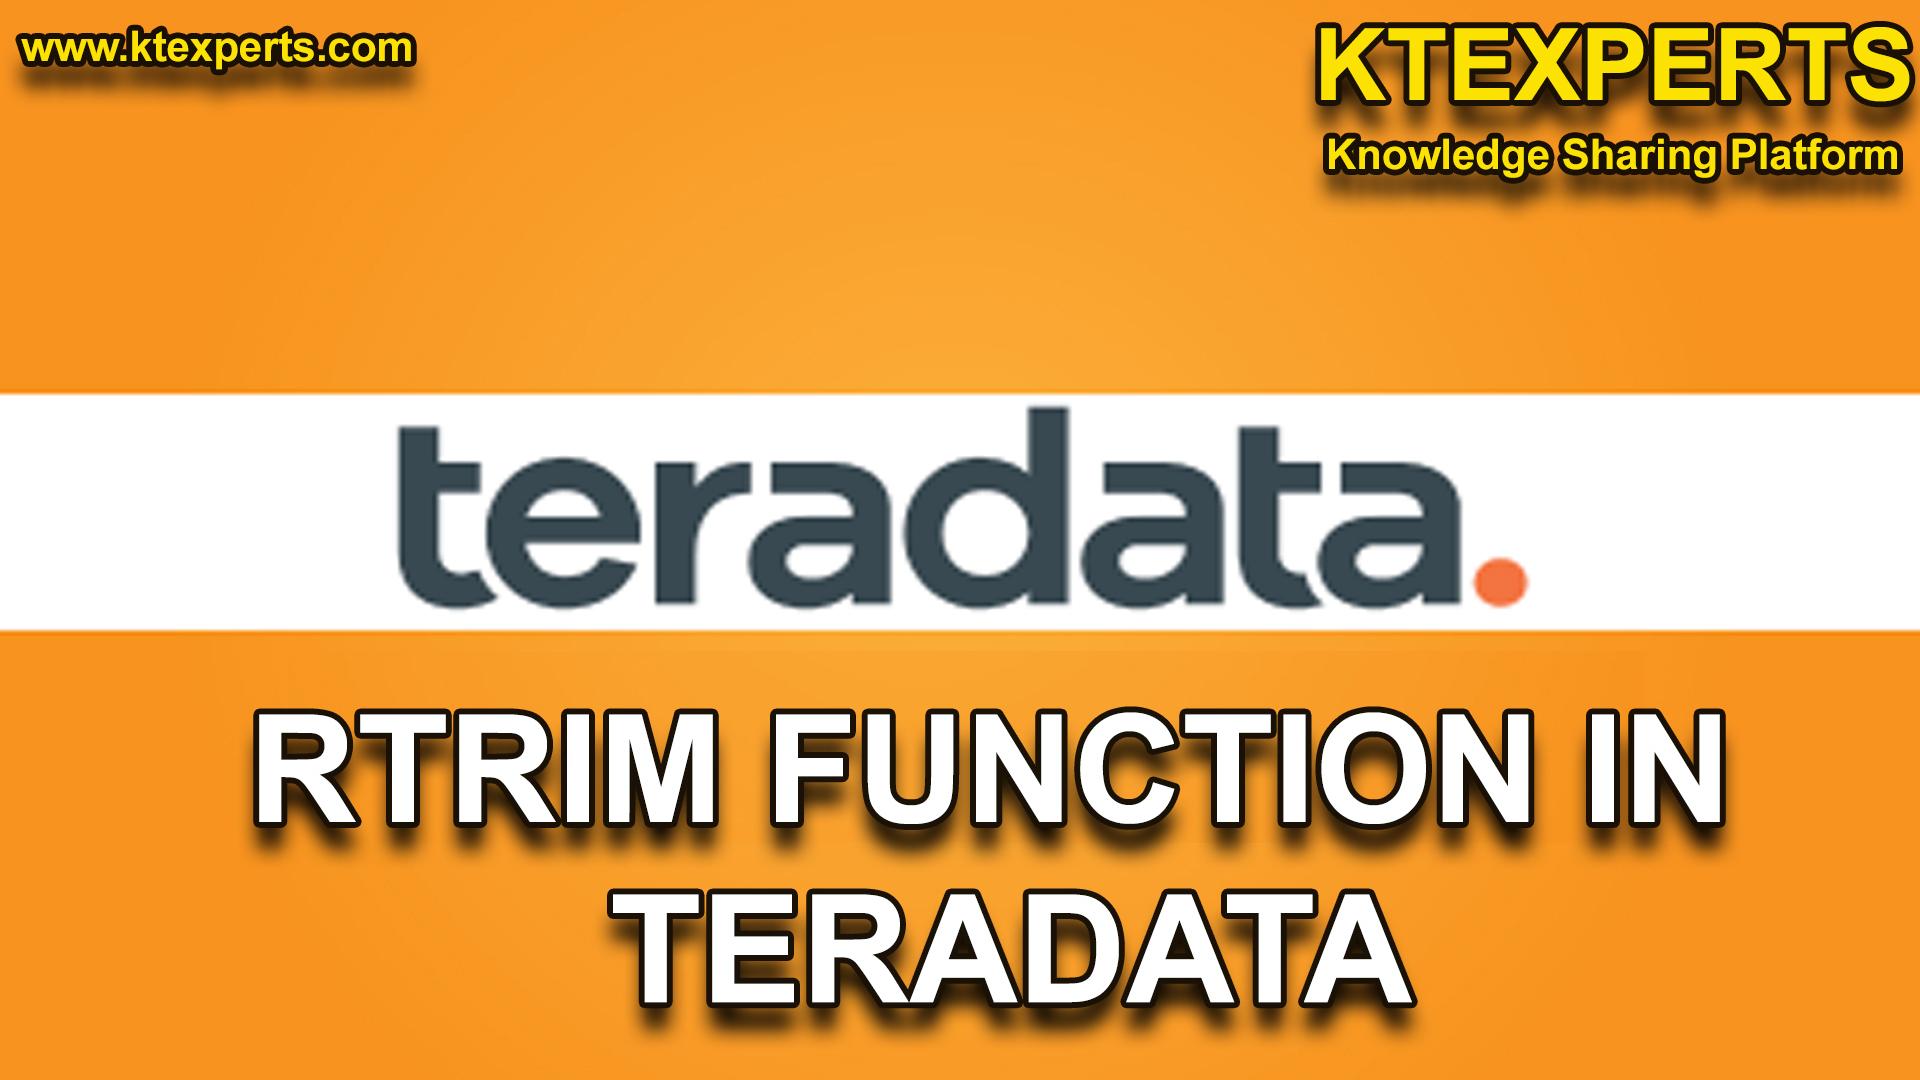 RTRIM FUNCTION IN TERADATA